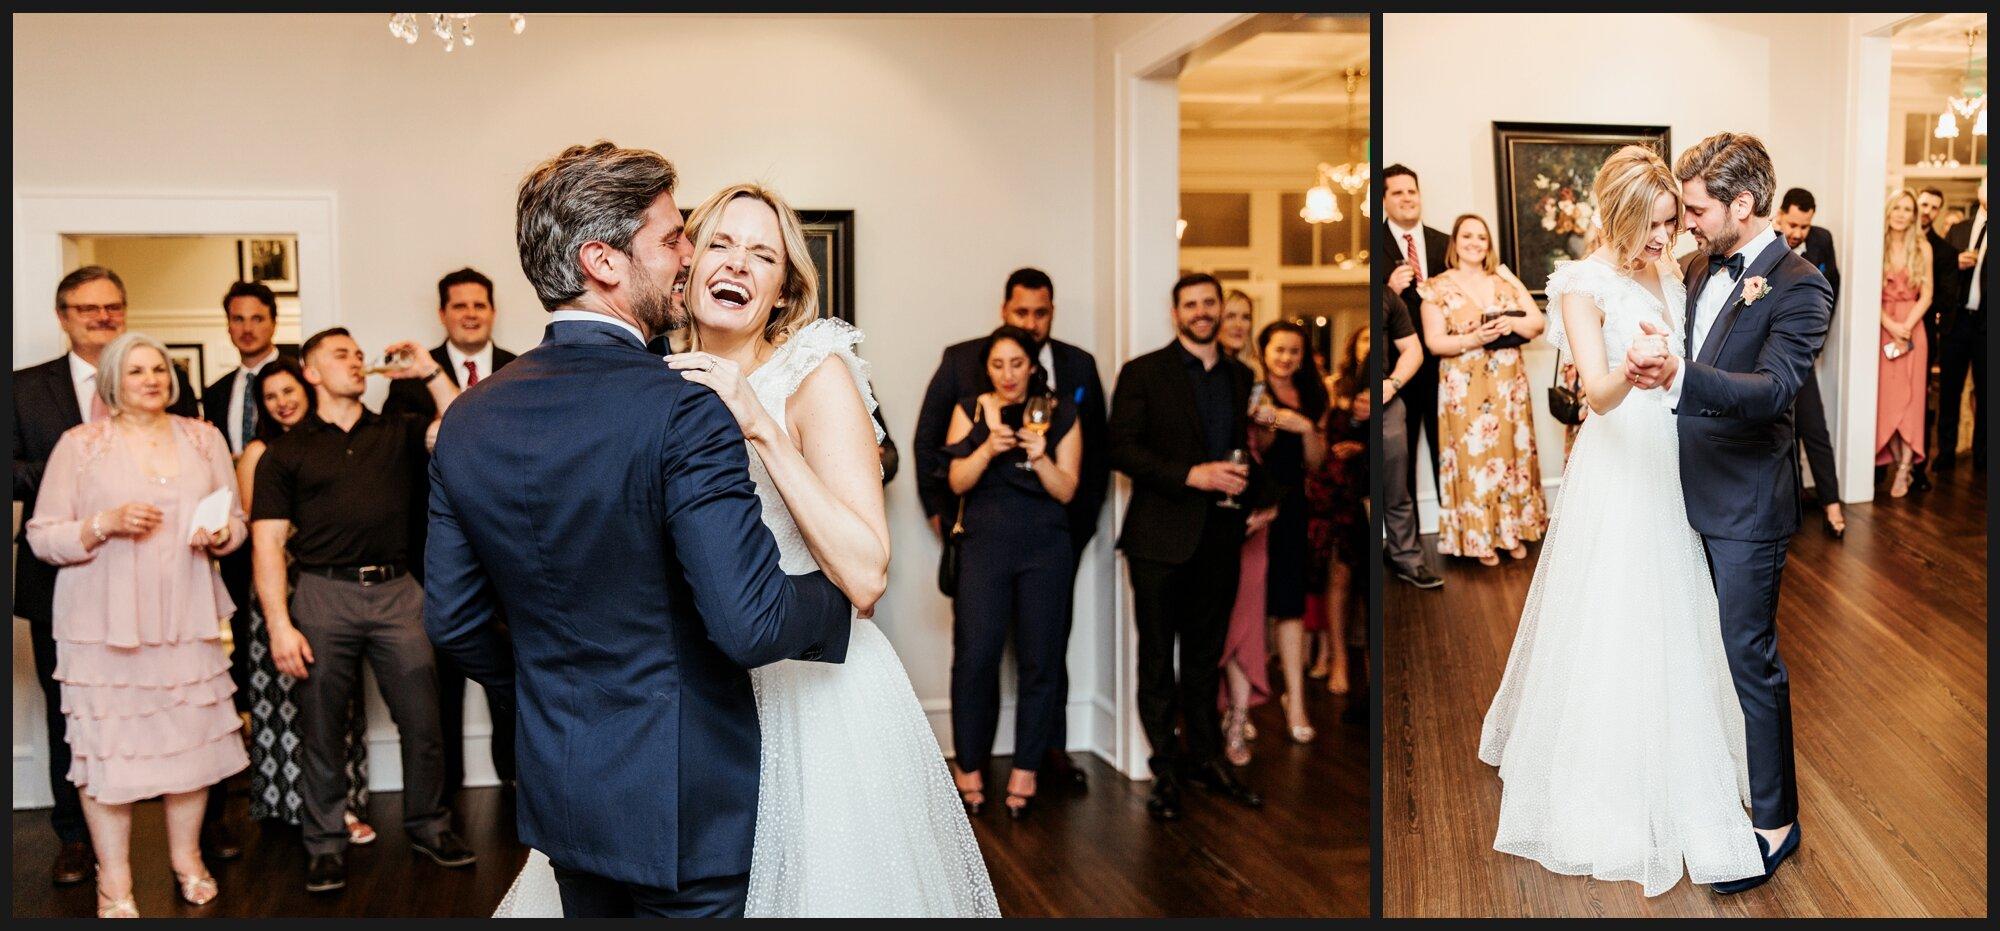 Orlando-Wedding-Photographer-destination-wedding-photographer-florida-wedding-photographer-hawaii-wedding-photographer_0714.jpg